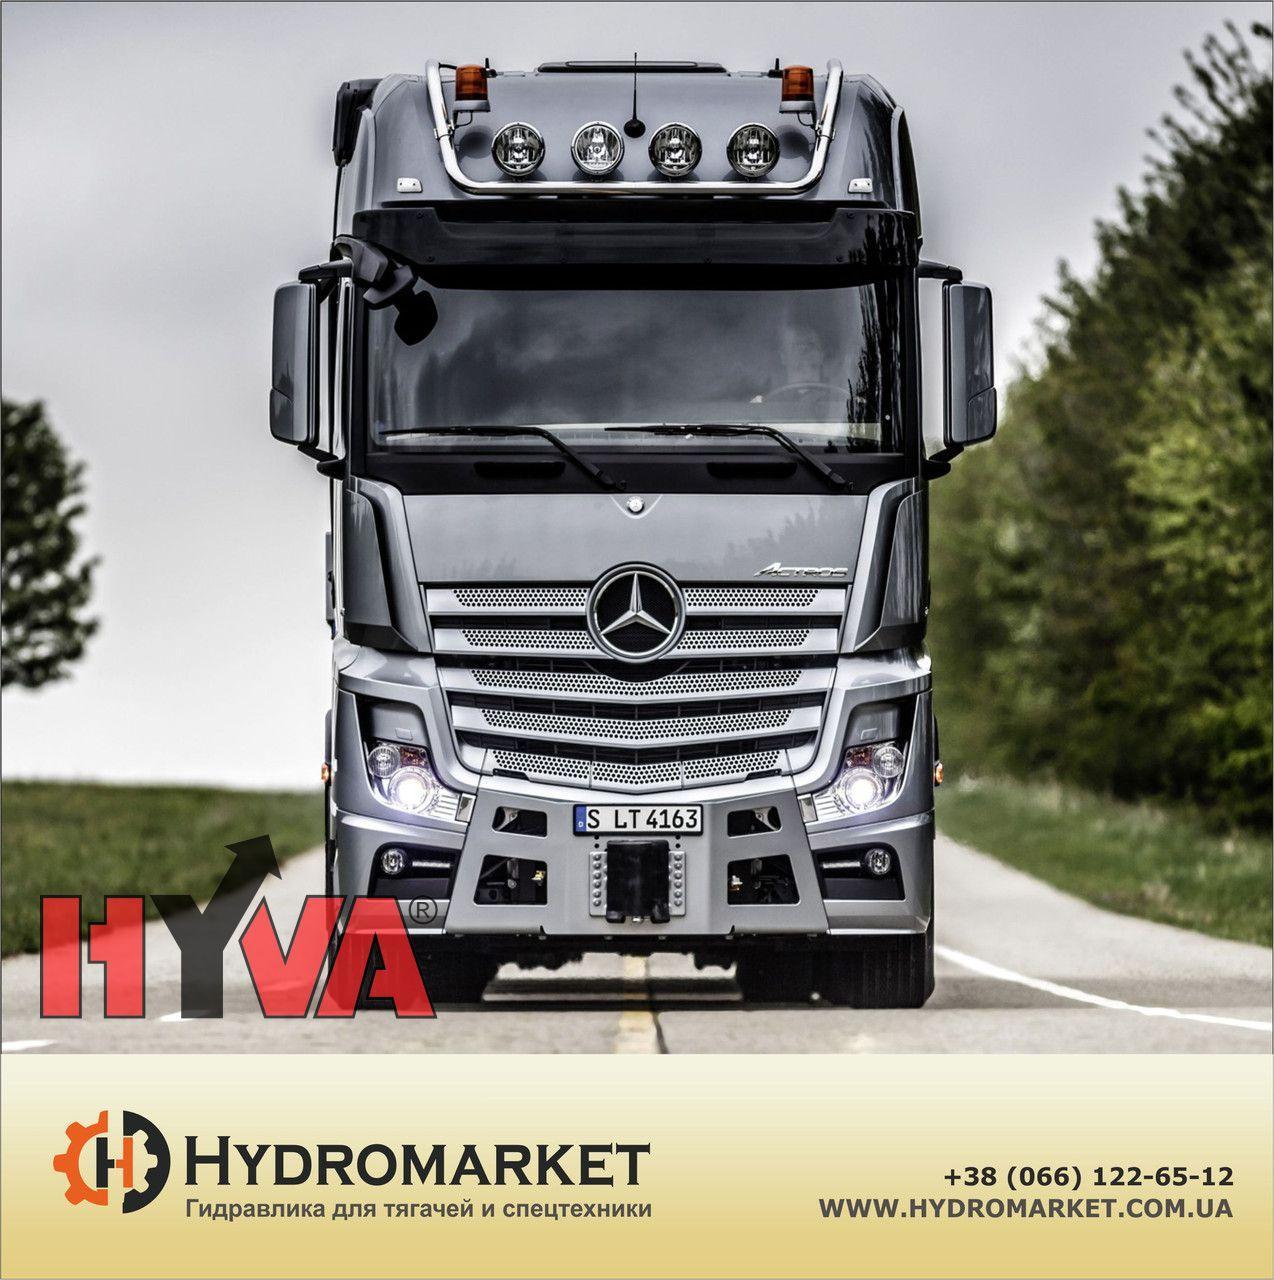 Комплект гидравлики  Hyva на  Мерседес Актрос (Mercedes Actros)